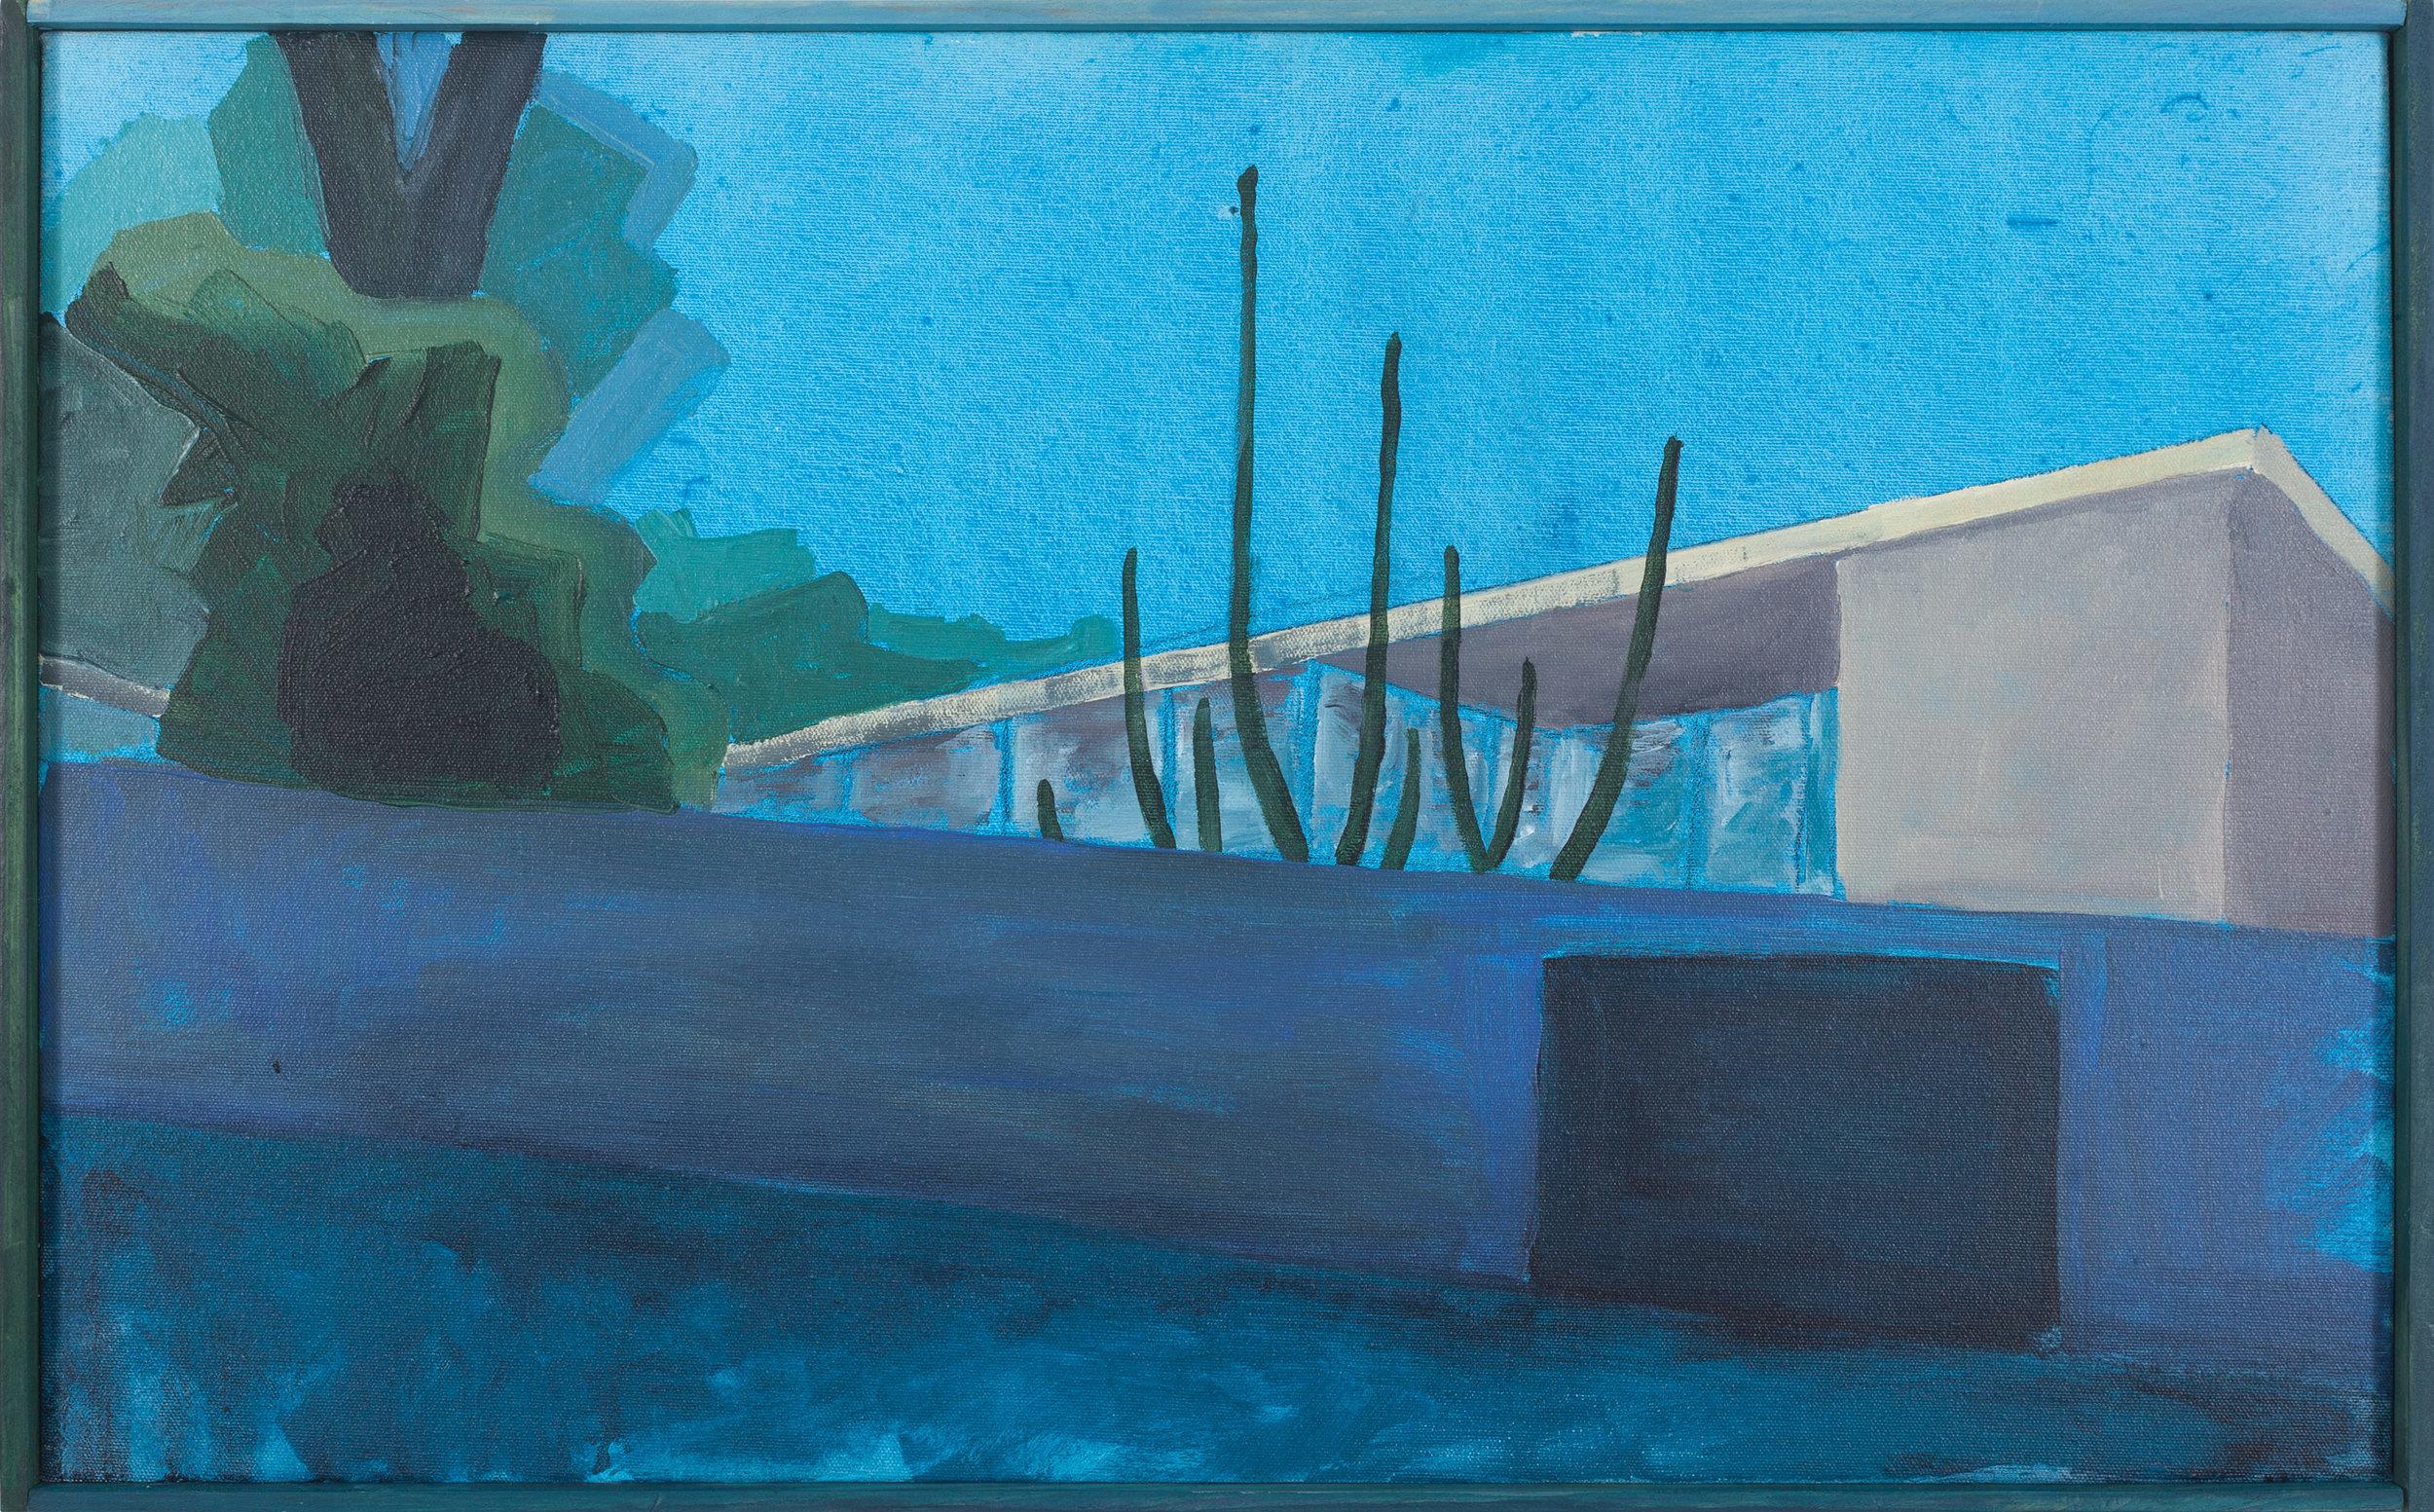 Vivienda privada 1949-III  , 2017, acrílico sobre tela, 43 x 70 cm.